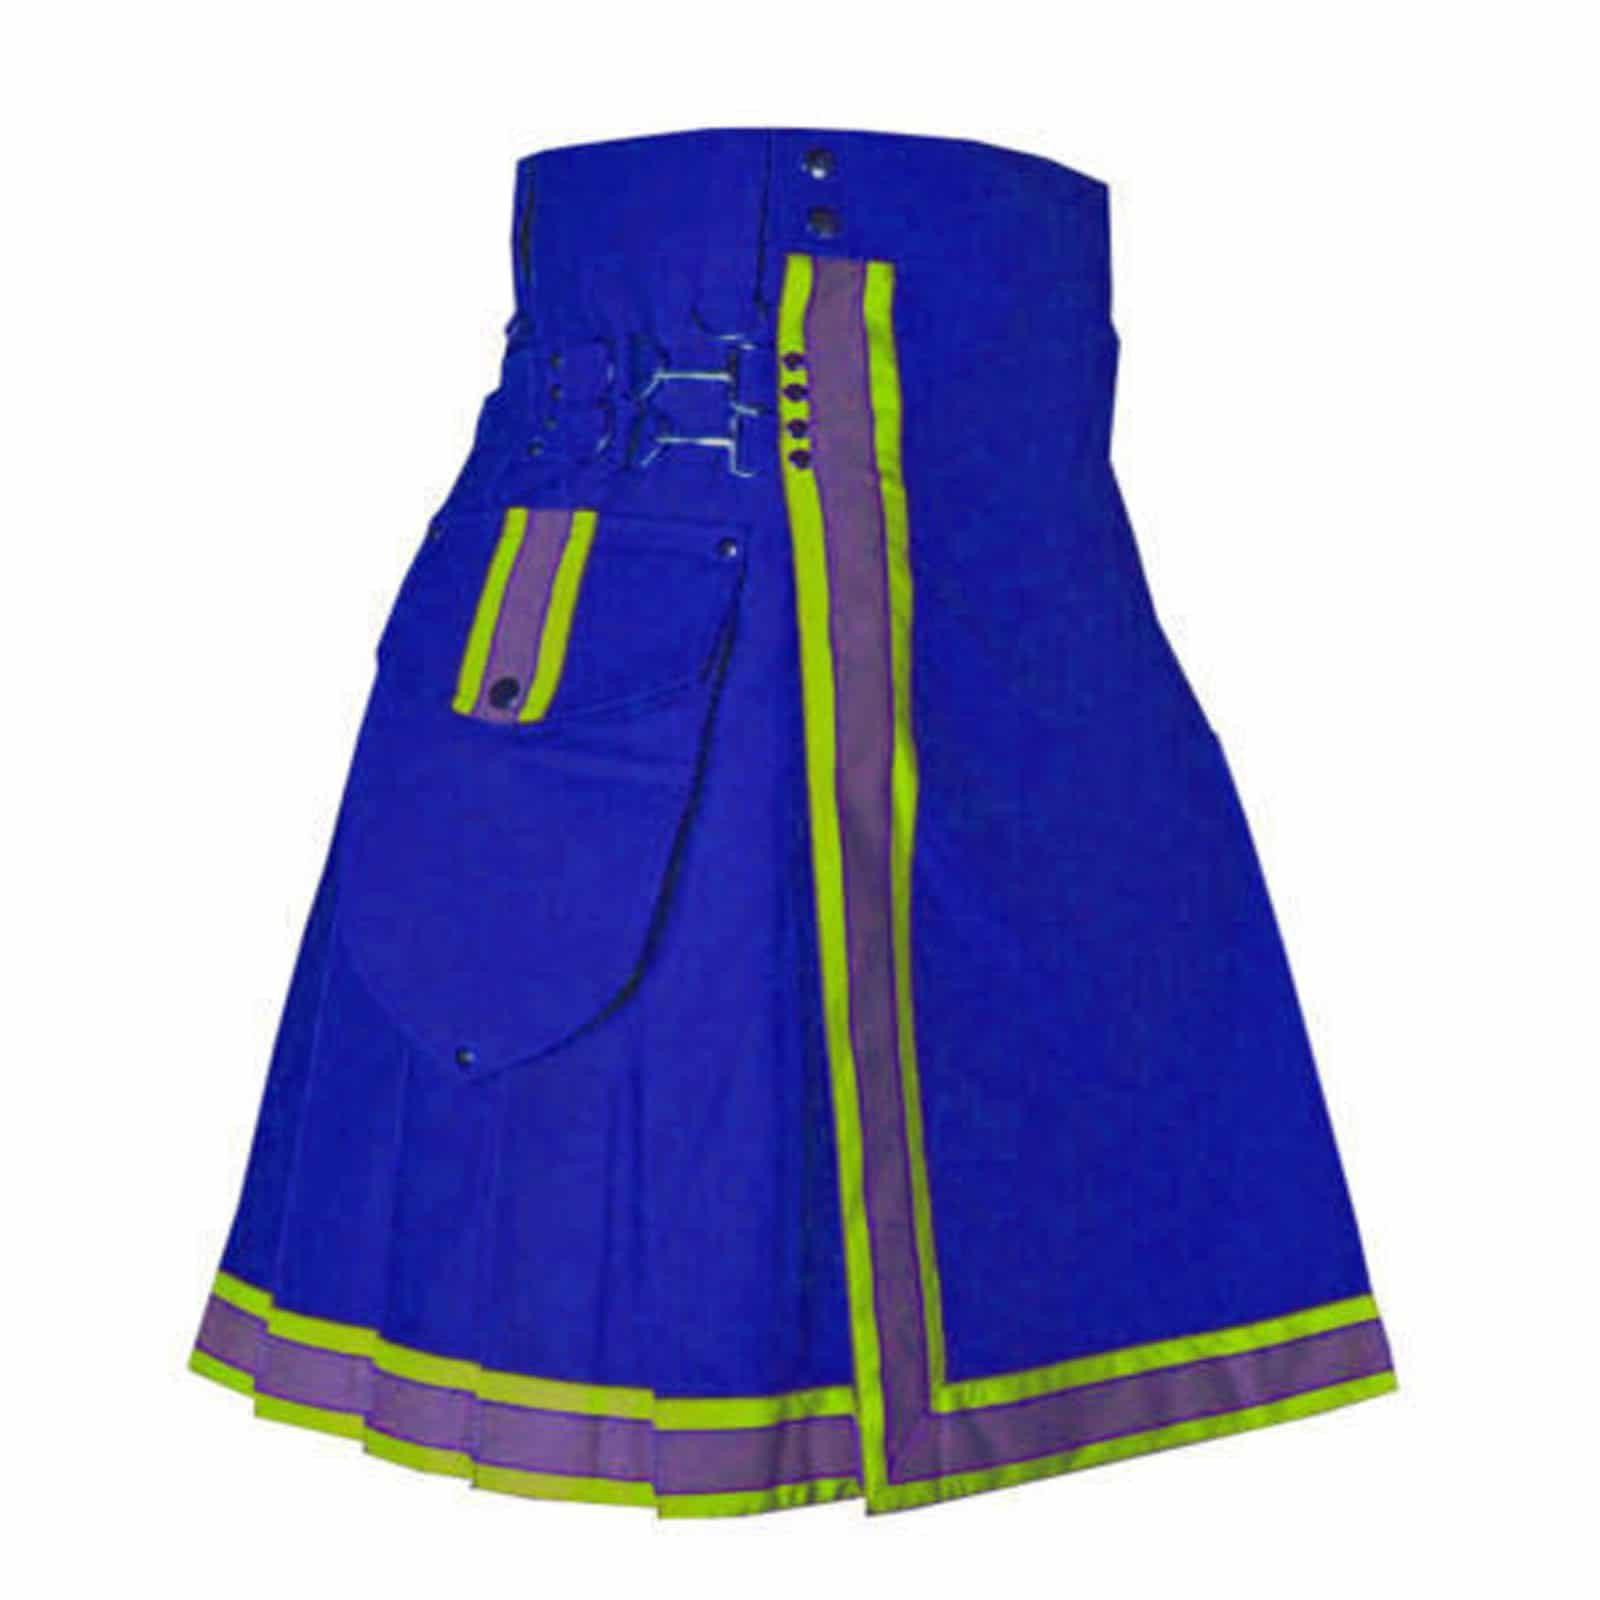 Blue Cargo Fashion Kilt, Fashion Kilt, Women Utility Kilts, Best Women Kilts